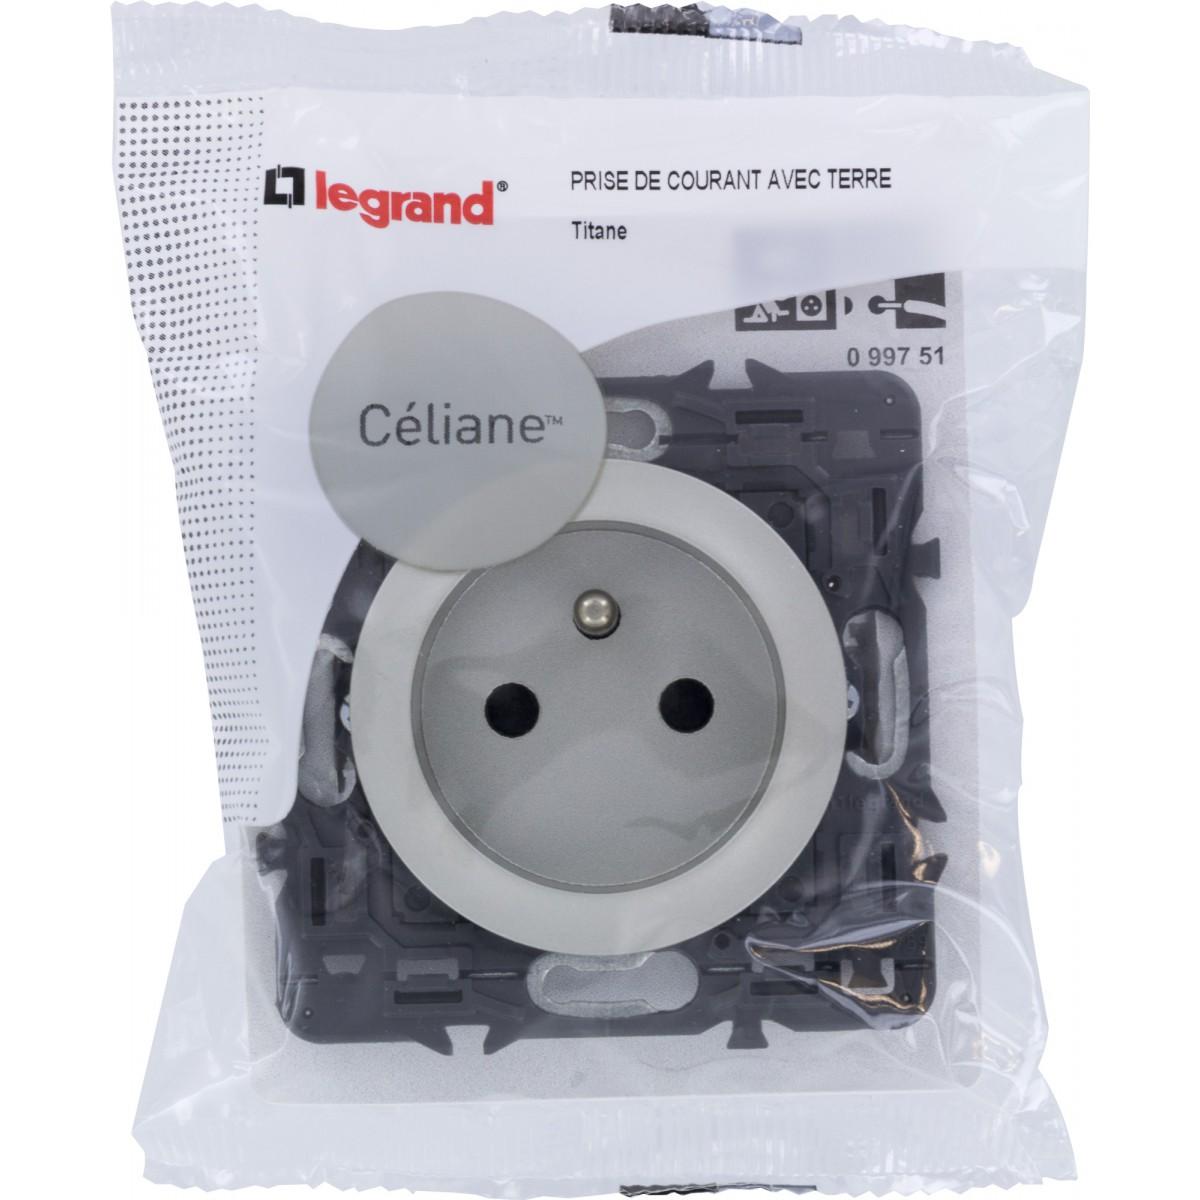 Prise de courant 2P+T Legrand - Céliane - Titane